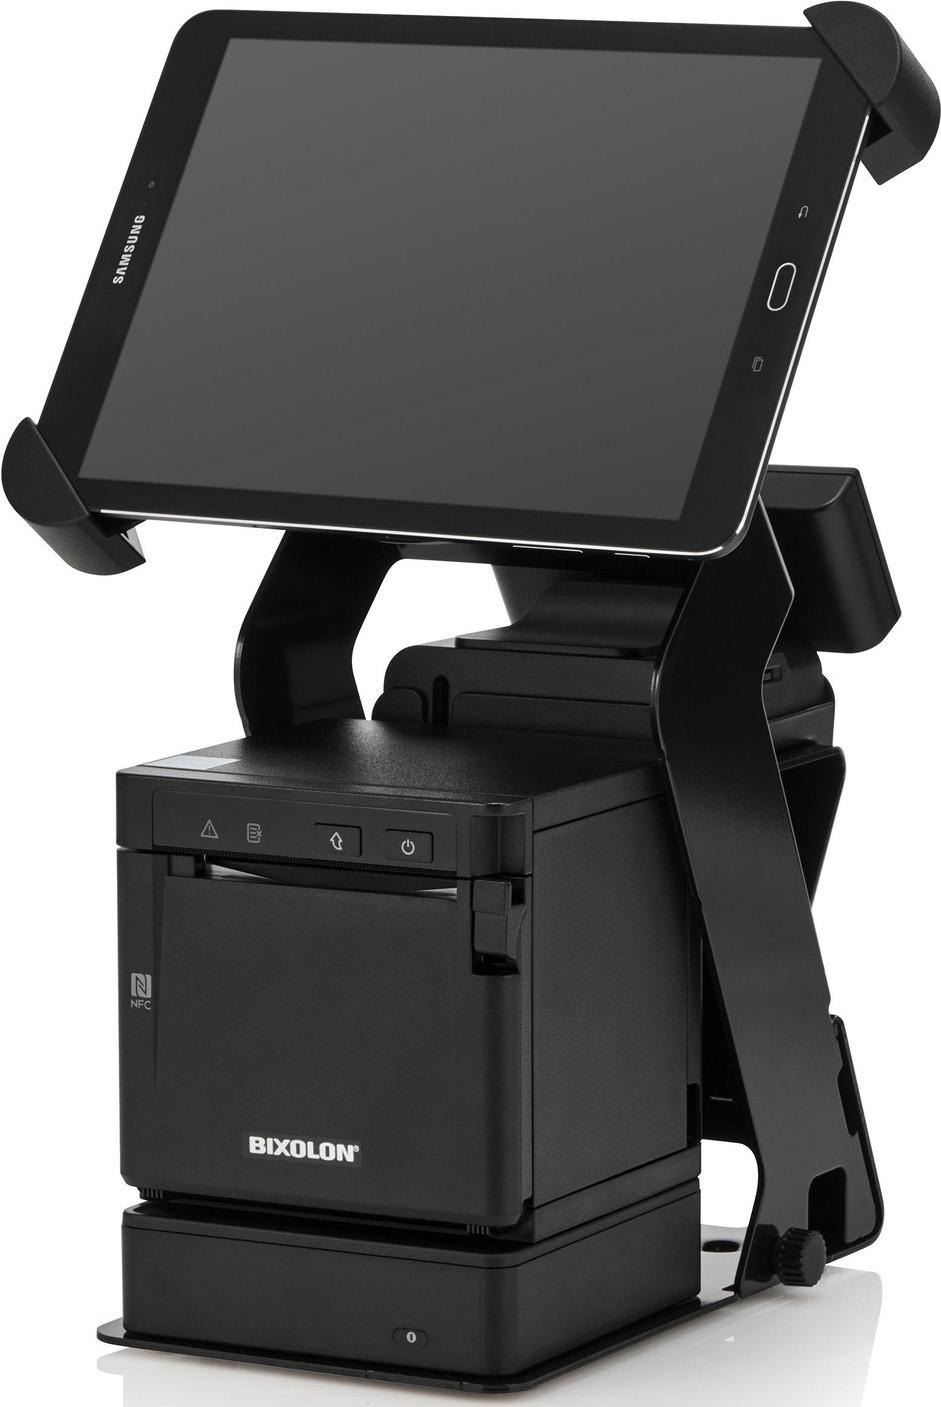 Bixolon RTS-Q300 Tablet Stand